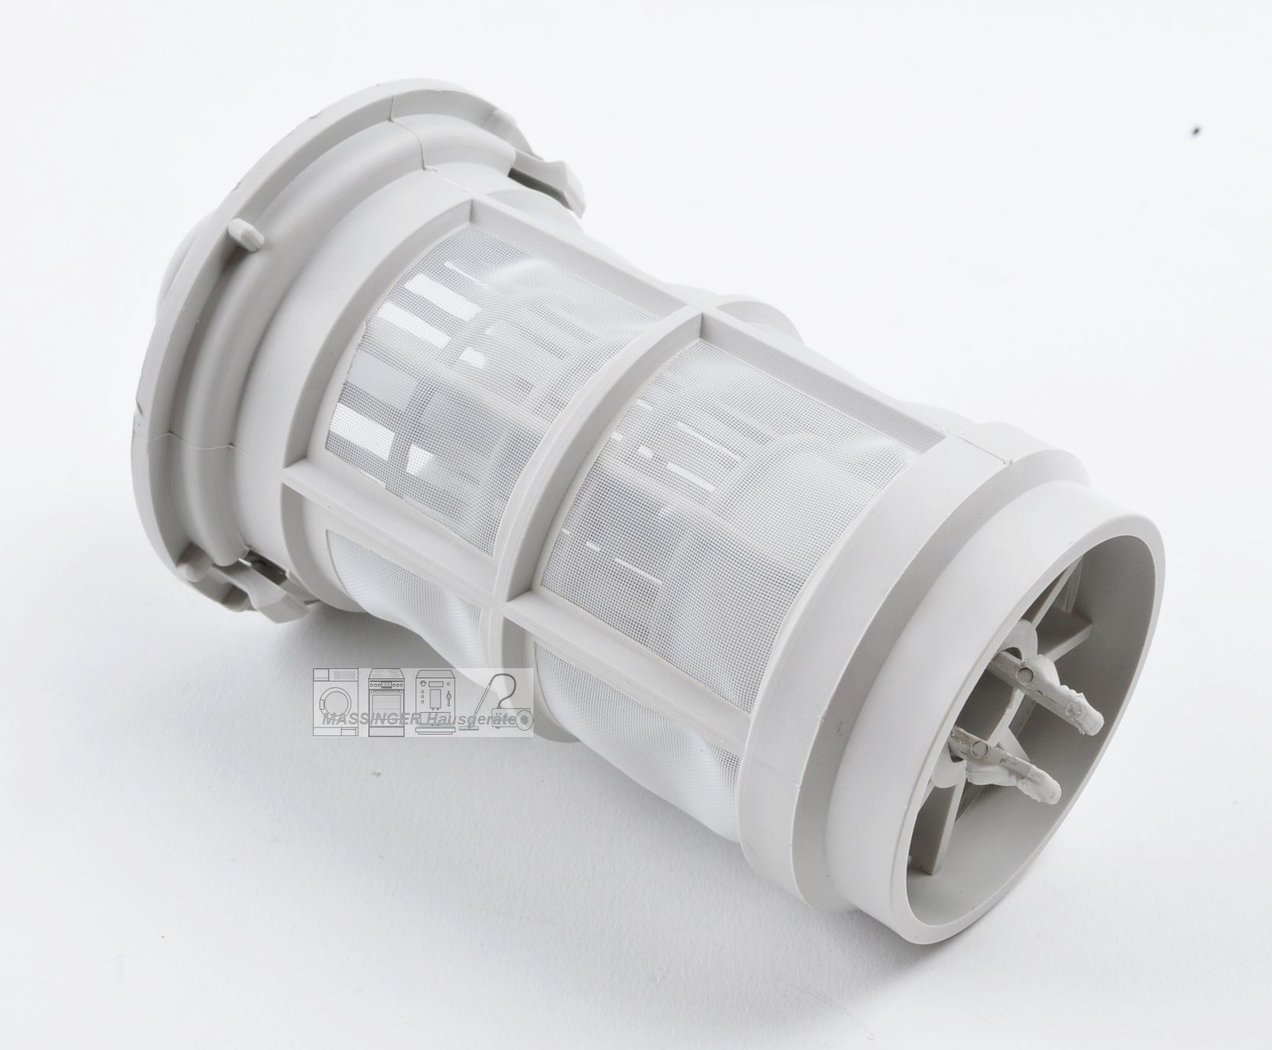 Aeg electrolux zanussi privileg grob feinsieb spulmaschine for Spülmaschine aeg